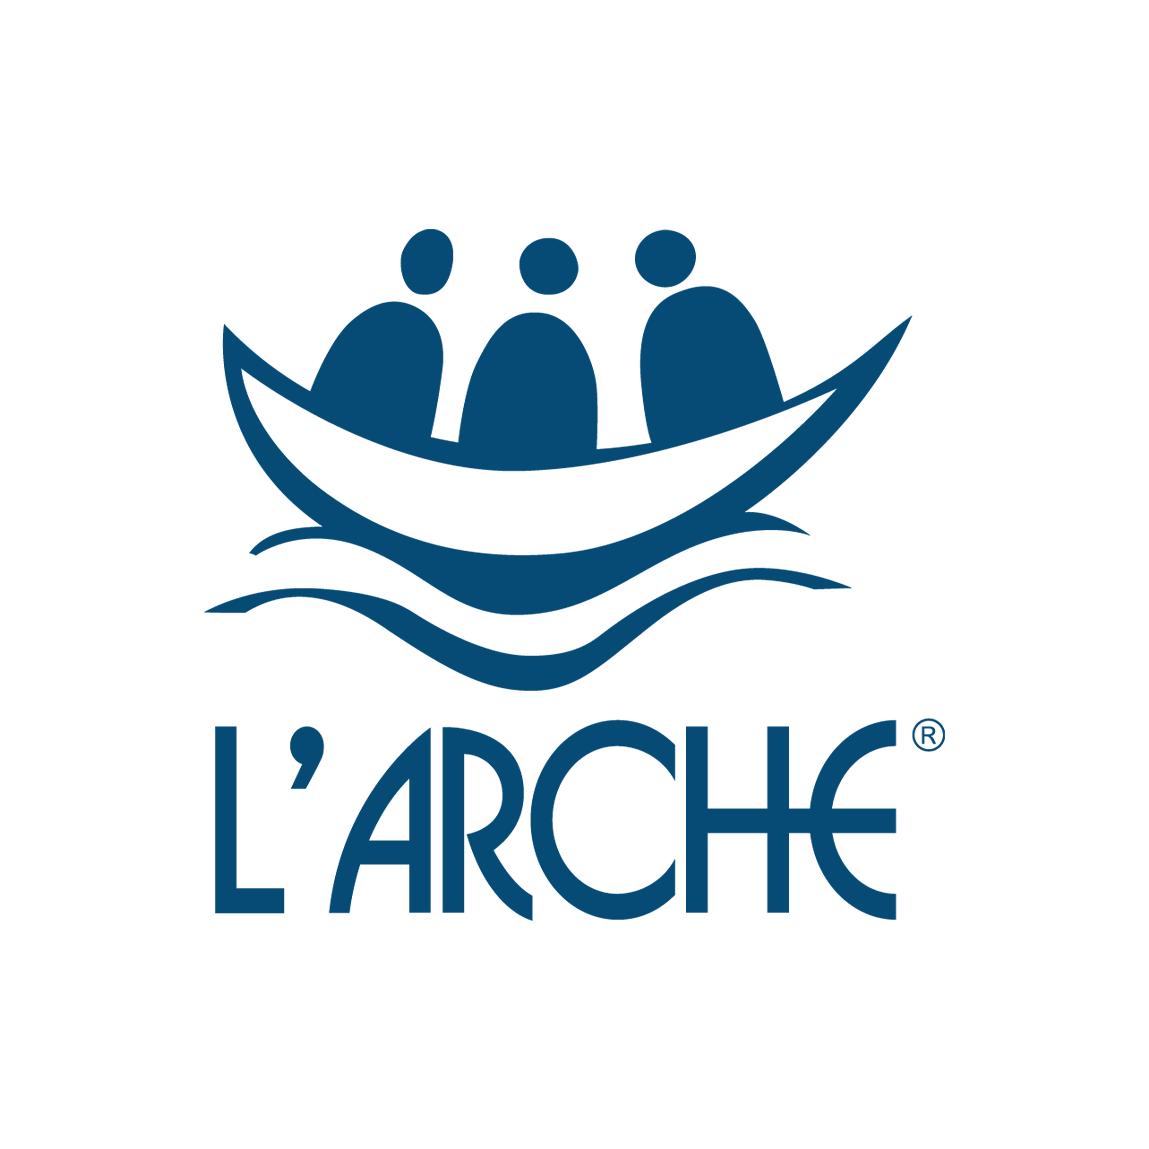 http://walterscontrols.net/wp-content/uploads/2019/12/larche.png